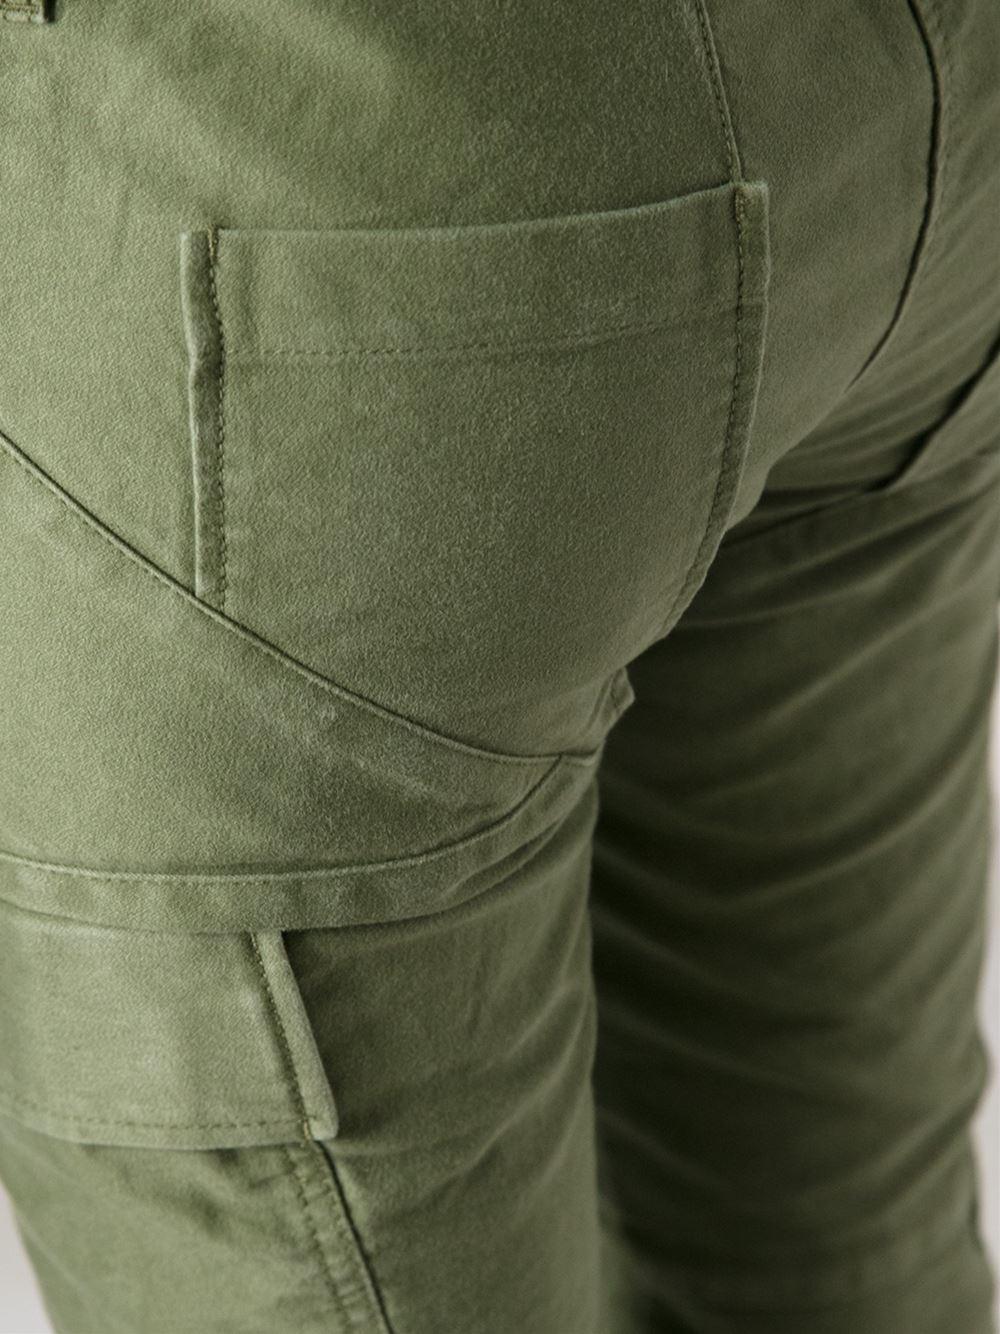 3.1 Phillip Lim Skinny Cargo Trouser - Gente Roma - Farfetch.com